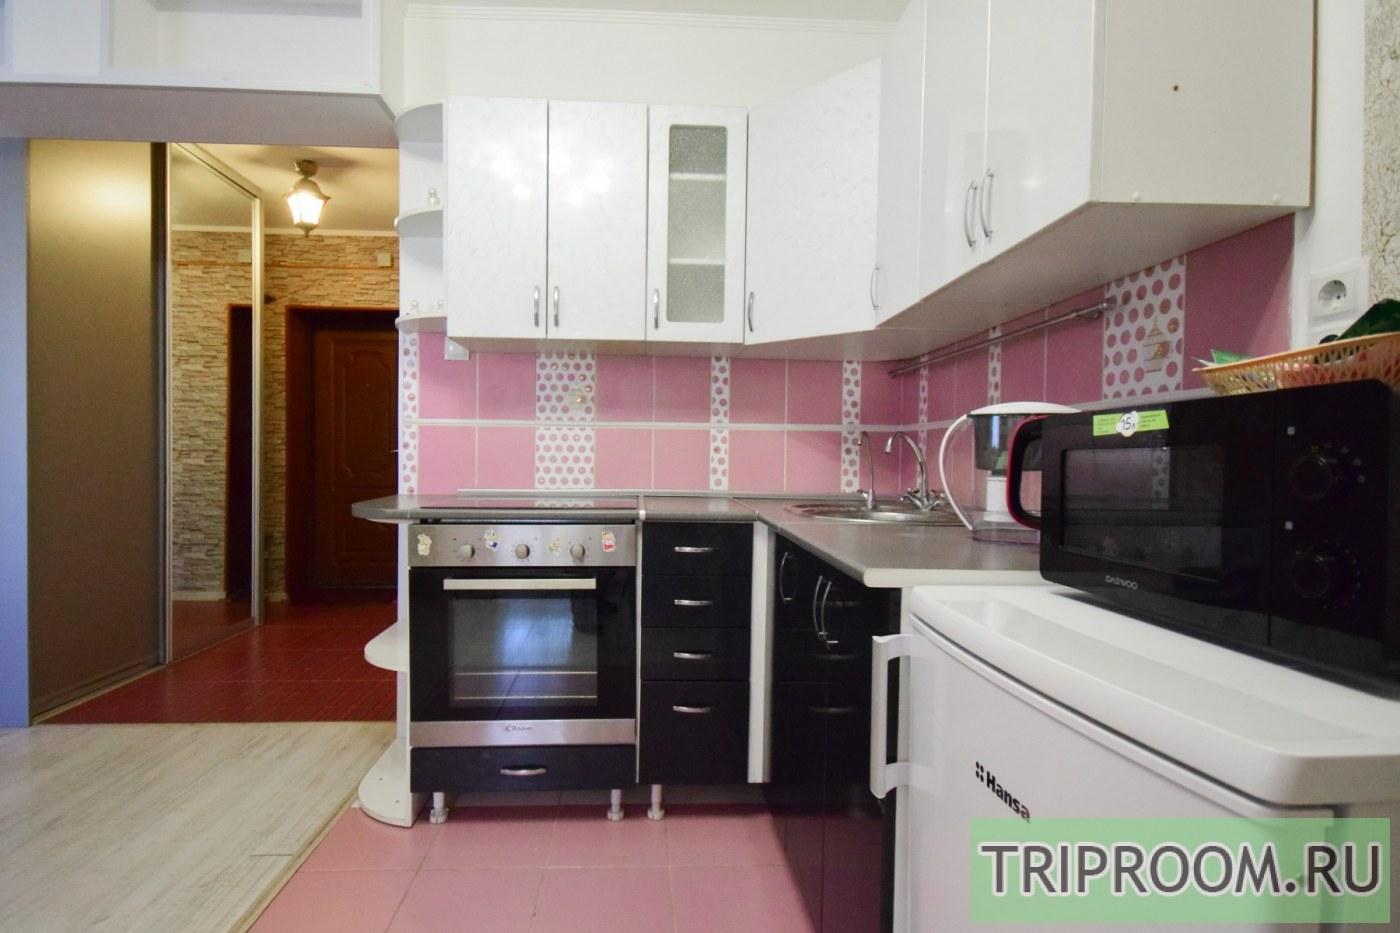 1-комнатная квартира посуточно (вариант № 36547), ул. Тихий переулок, фото № 10